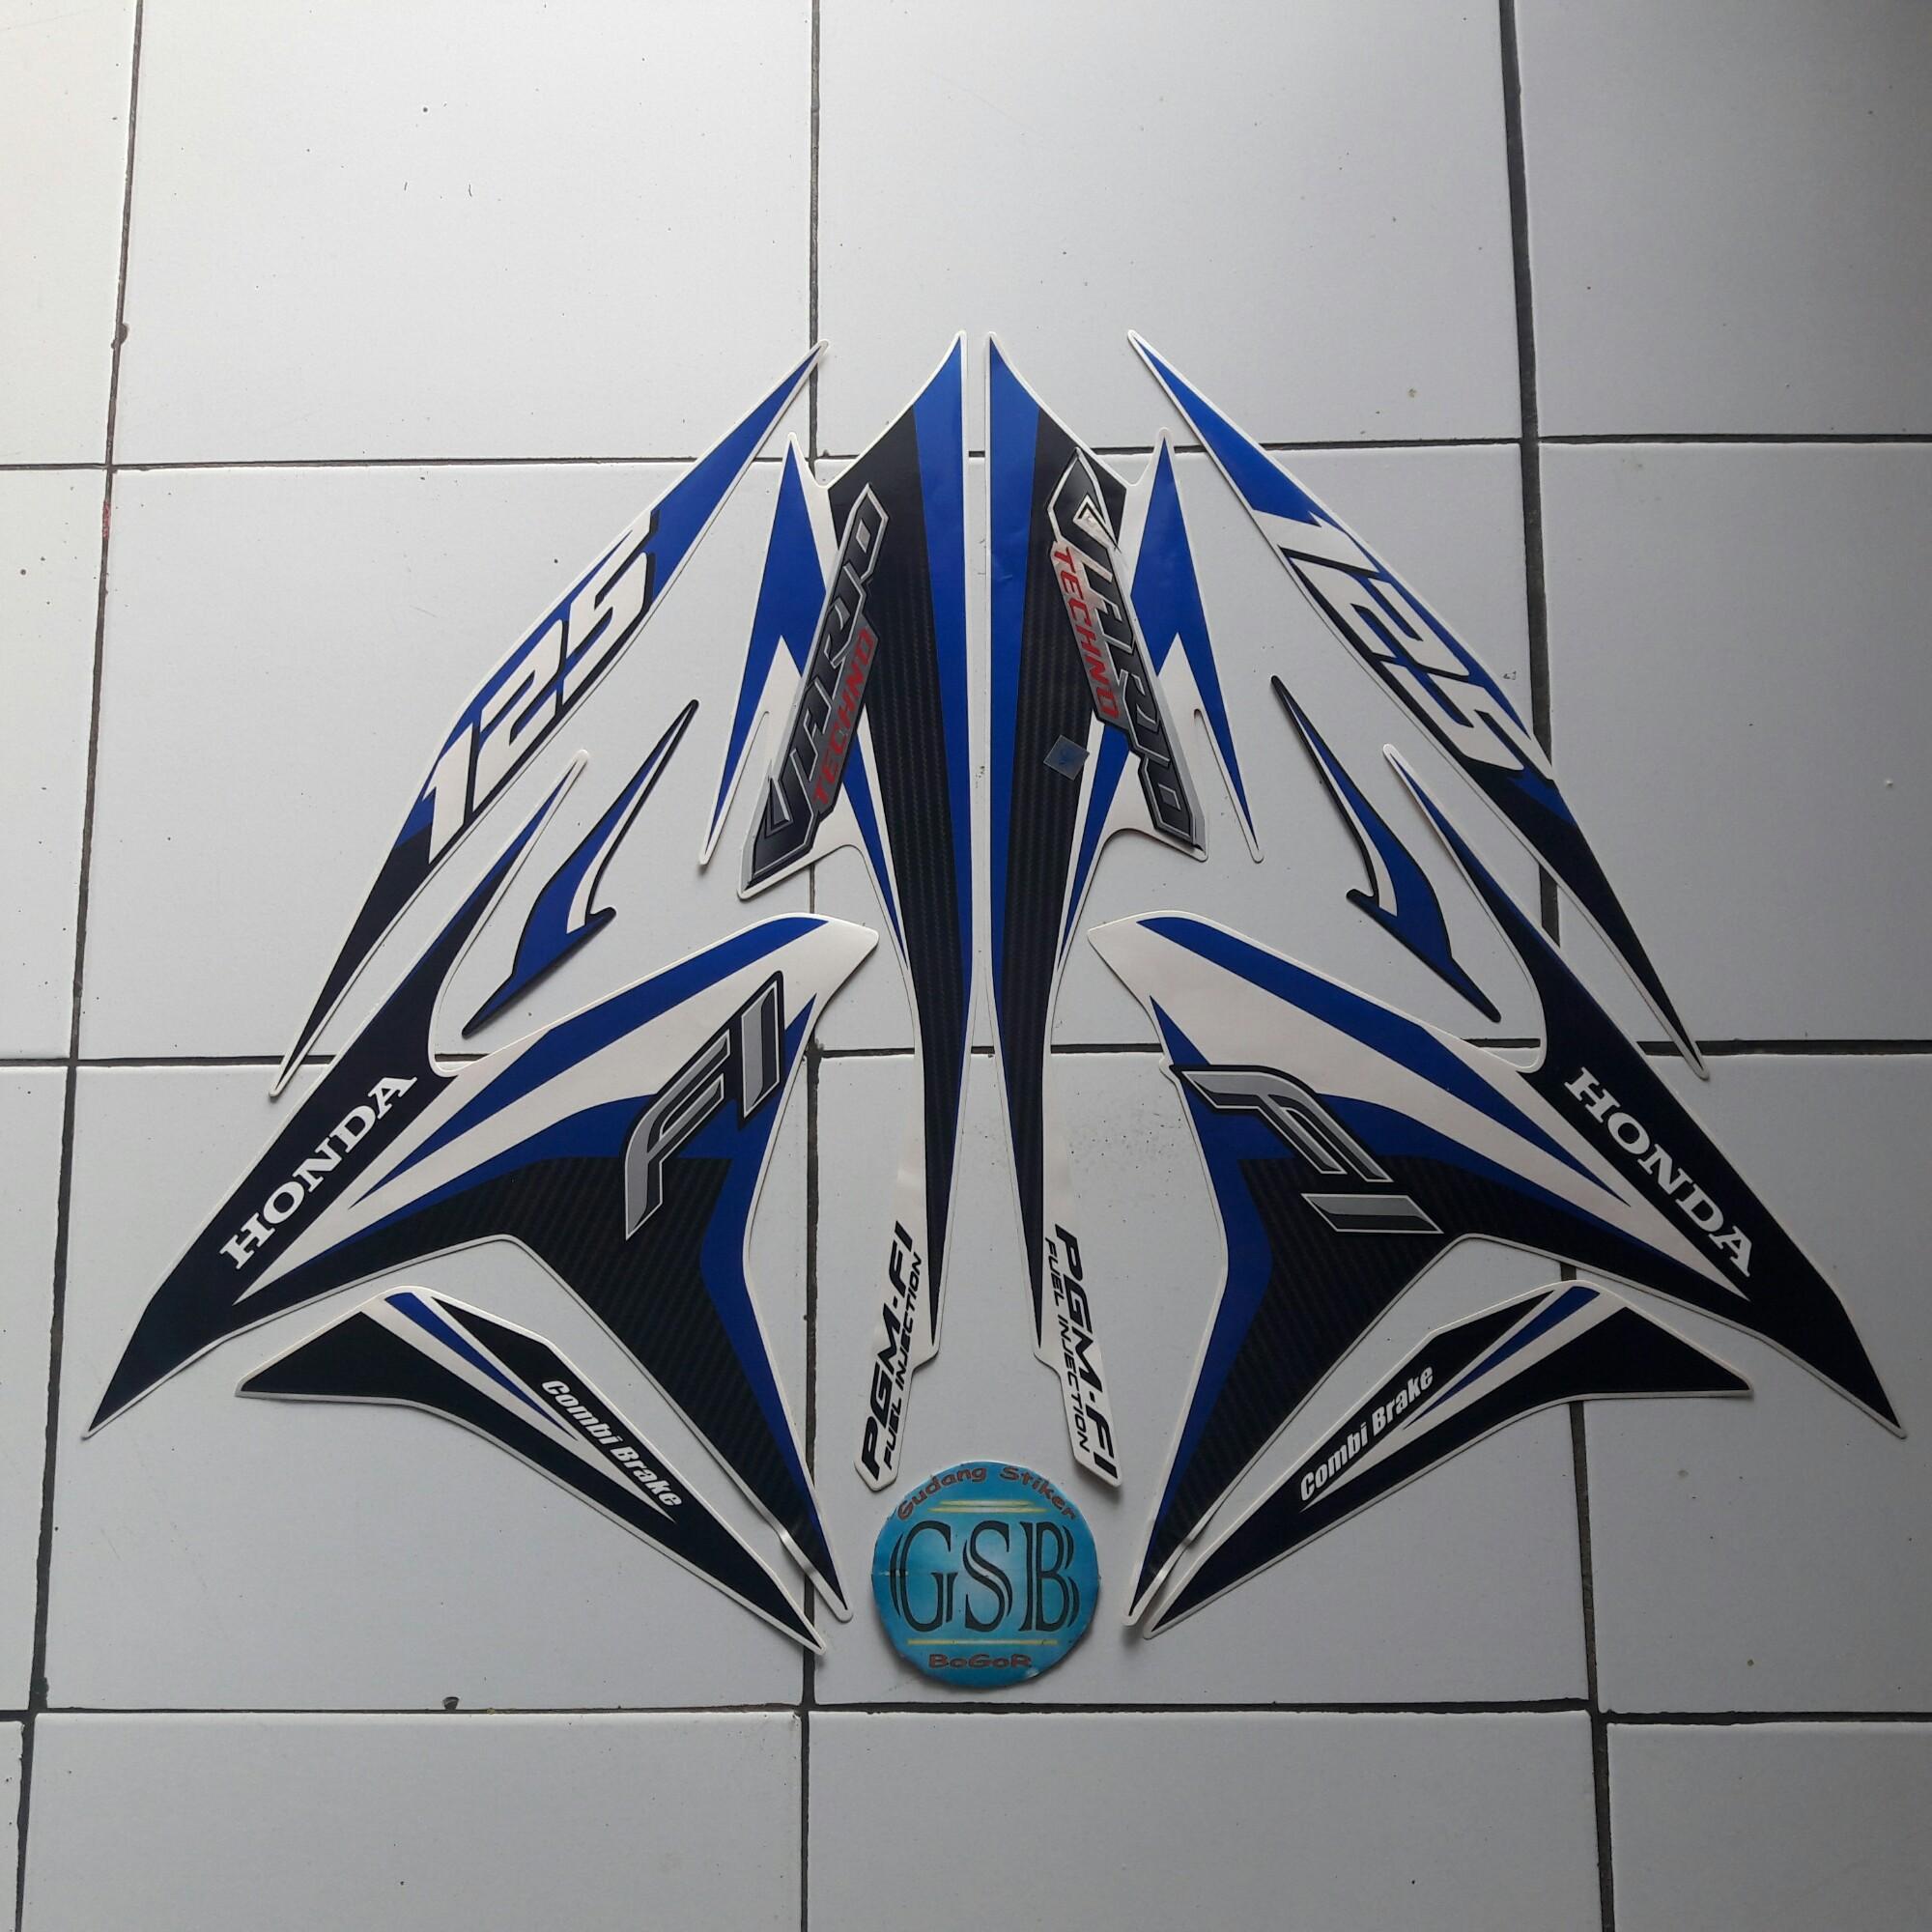 Stiker striping motor honda vario techno 125 2014 putih biru